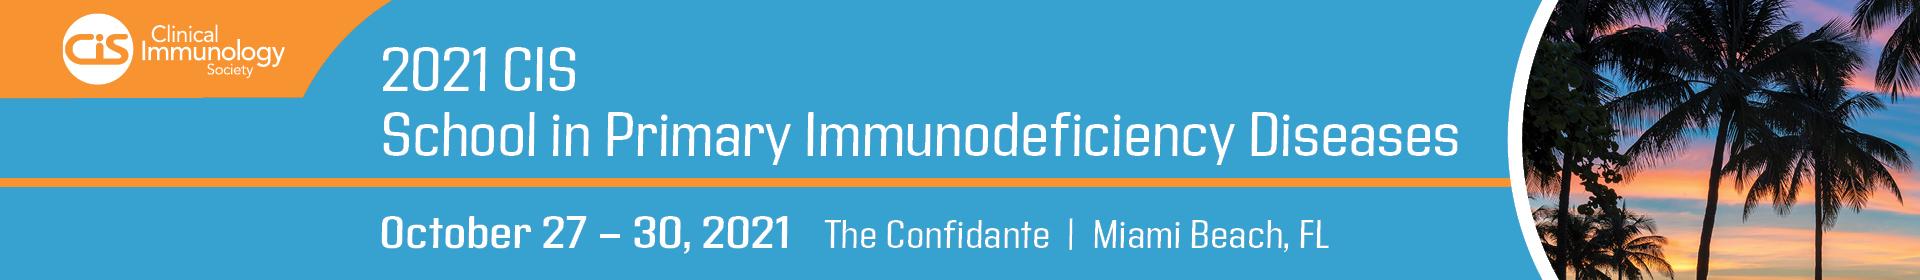 2021 School in Primary Immunodeficiency Diseases Event Banner